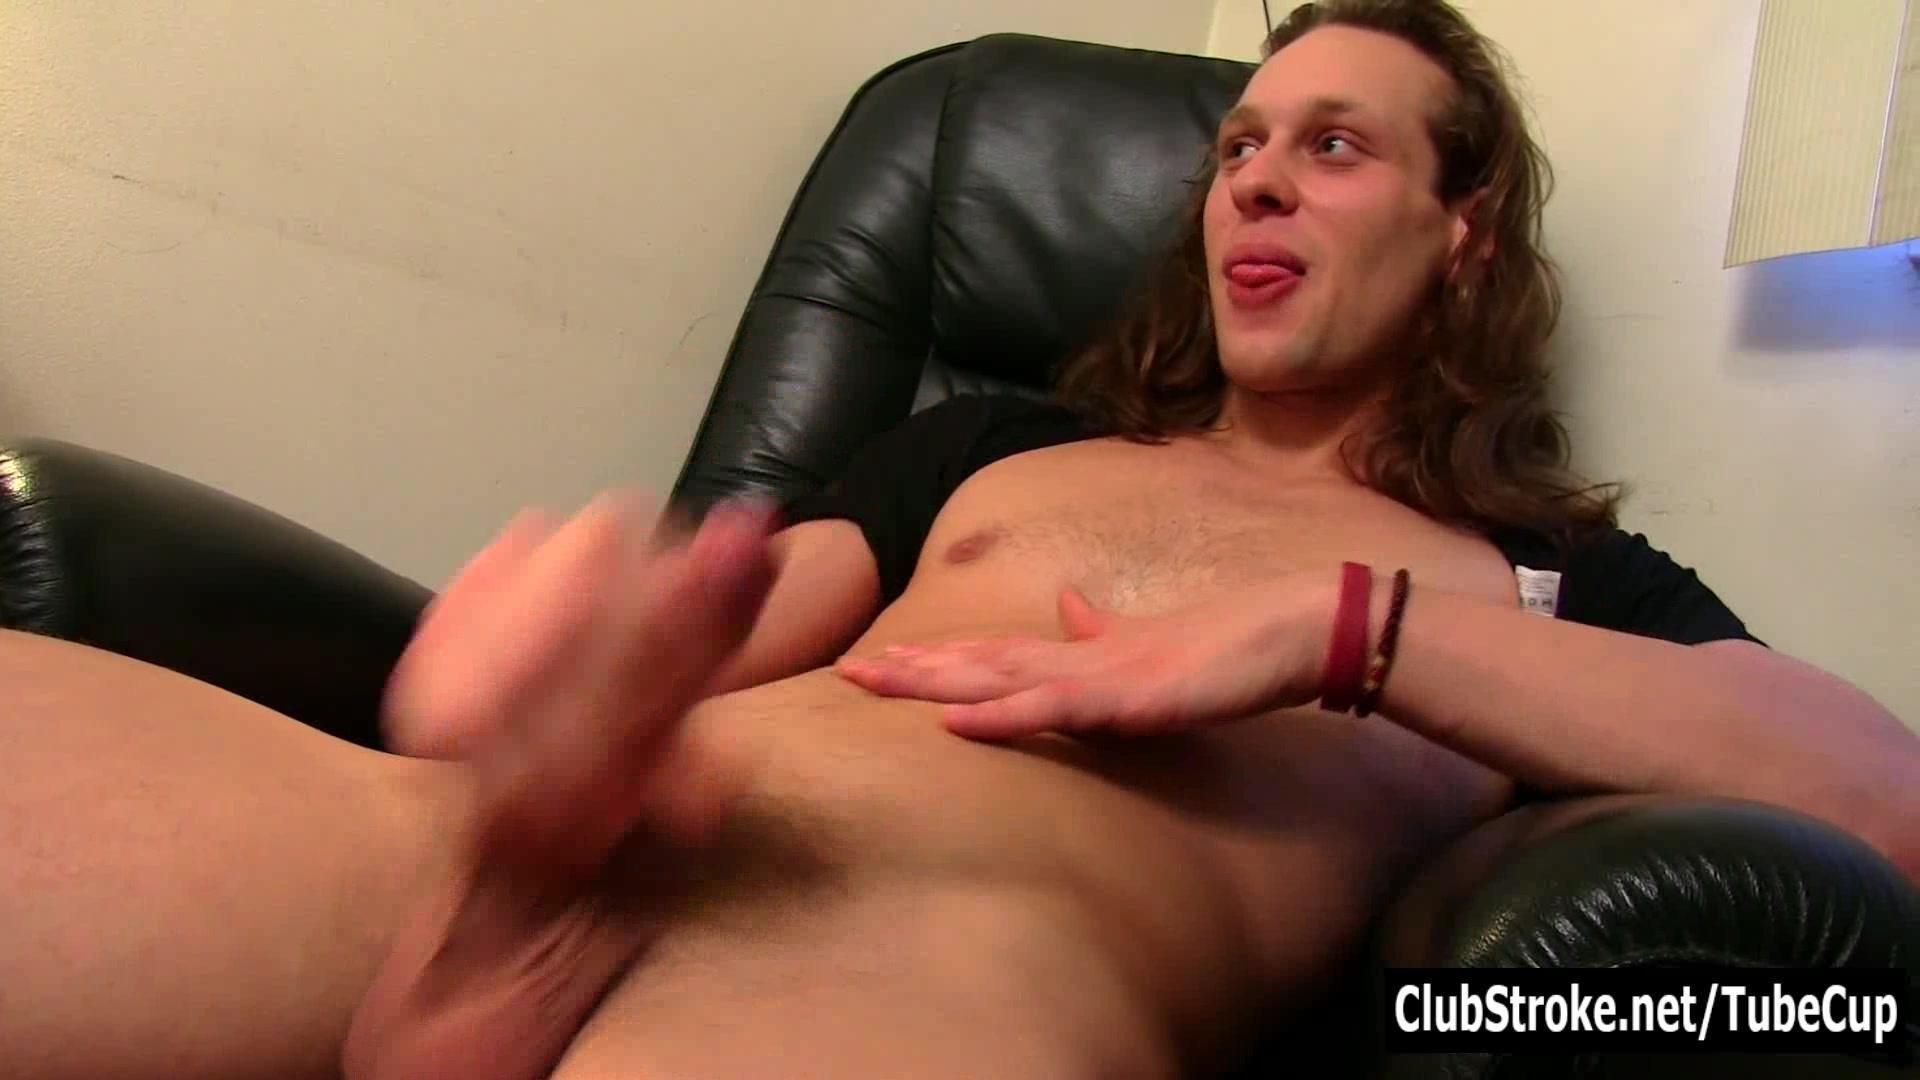 Awesome Straight Nikka Masturbating brooke skye fuck videos free